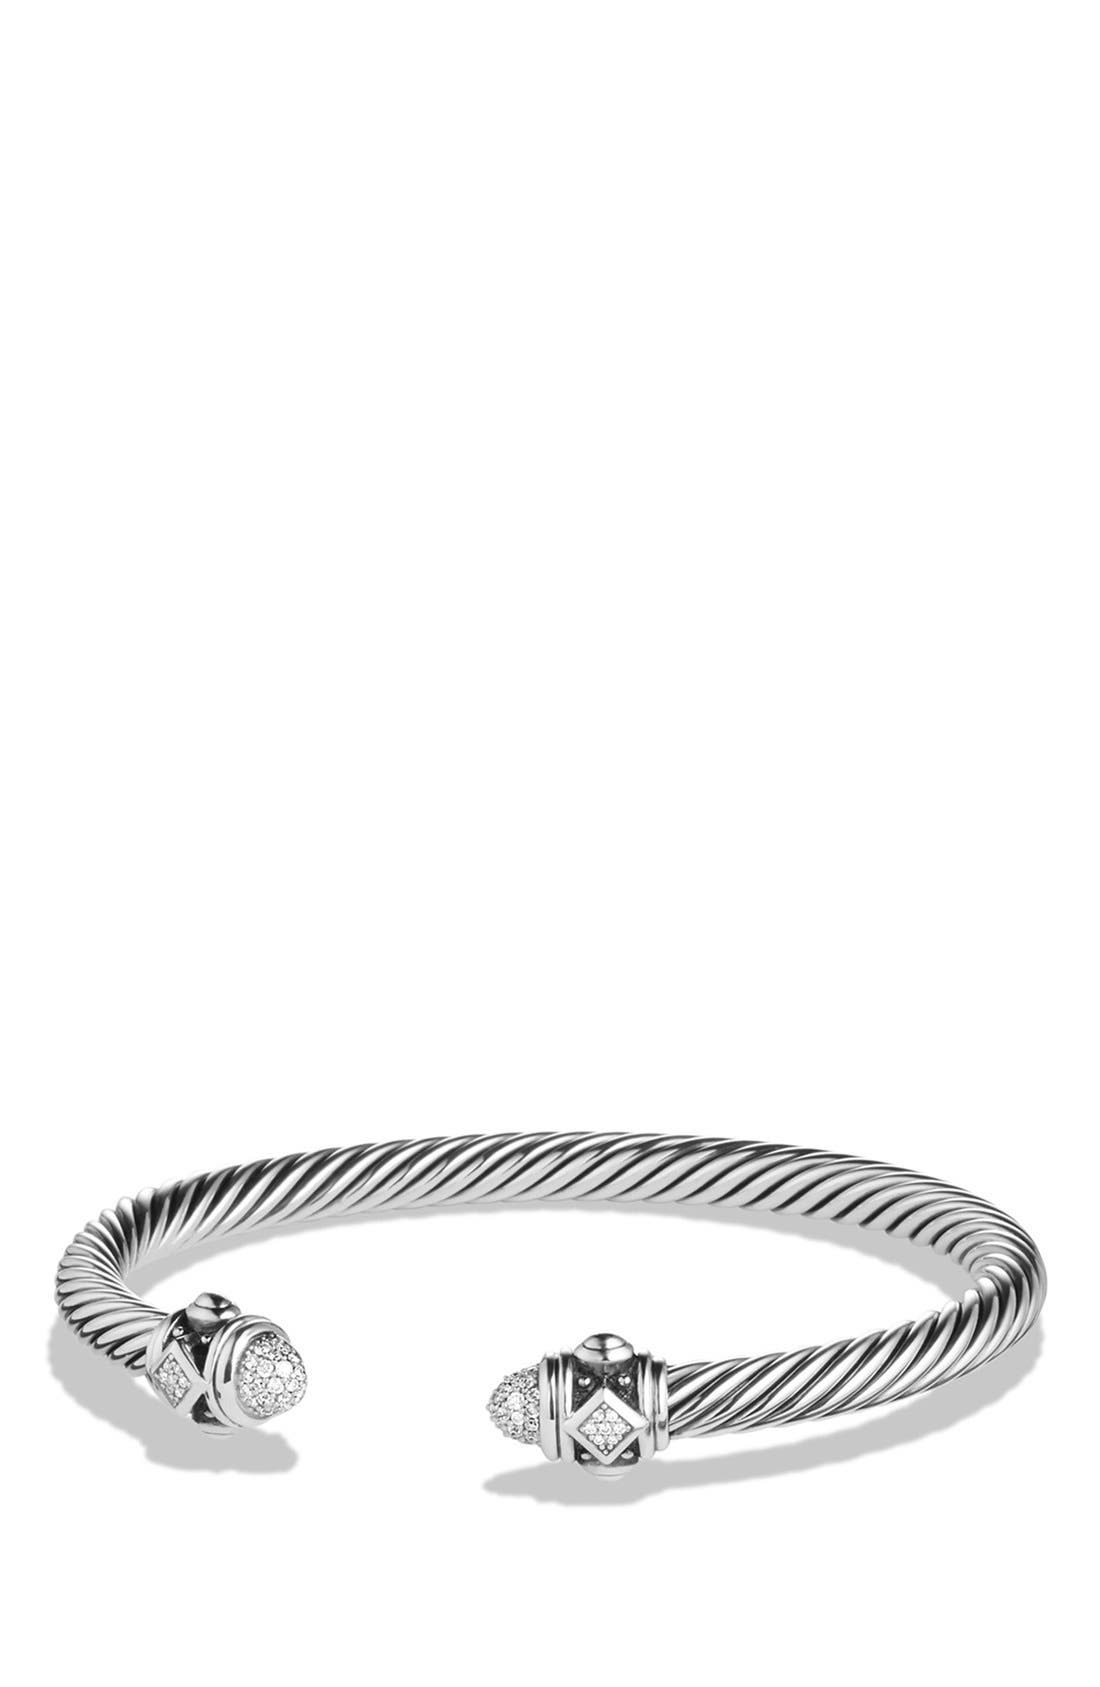 Renaissance Bracelet with Diamonds in Silver, 5mm,                         Main,                         color, DIAMOND